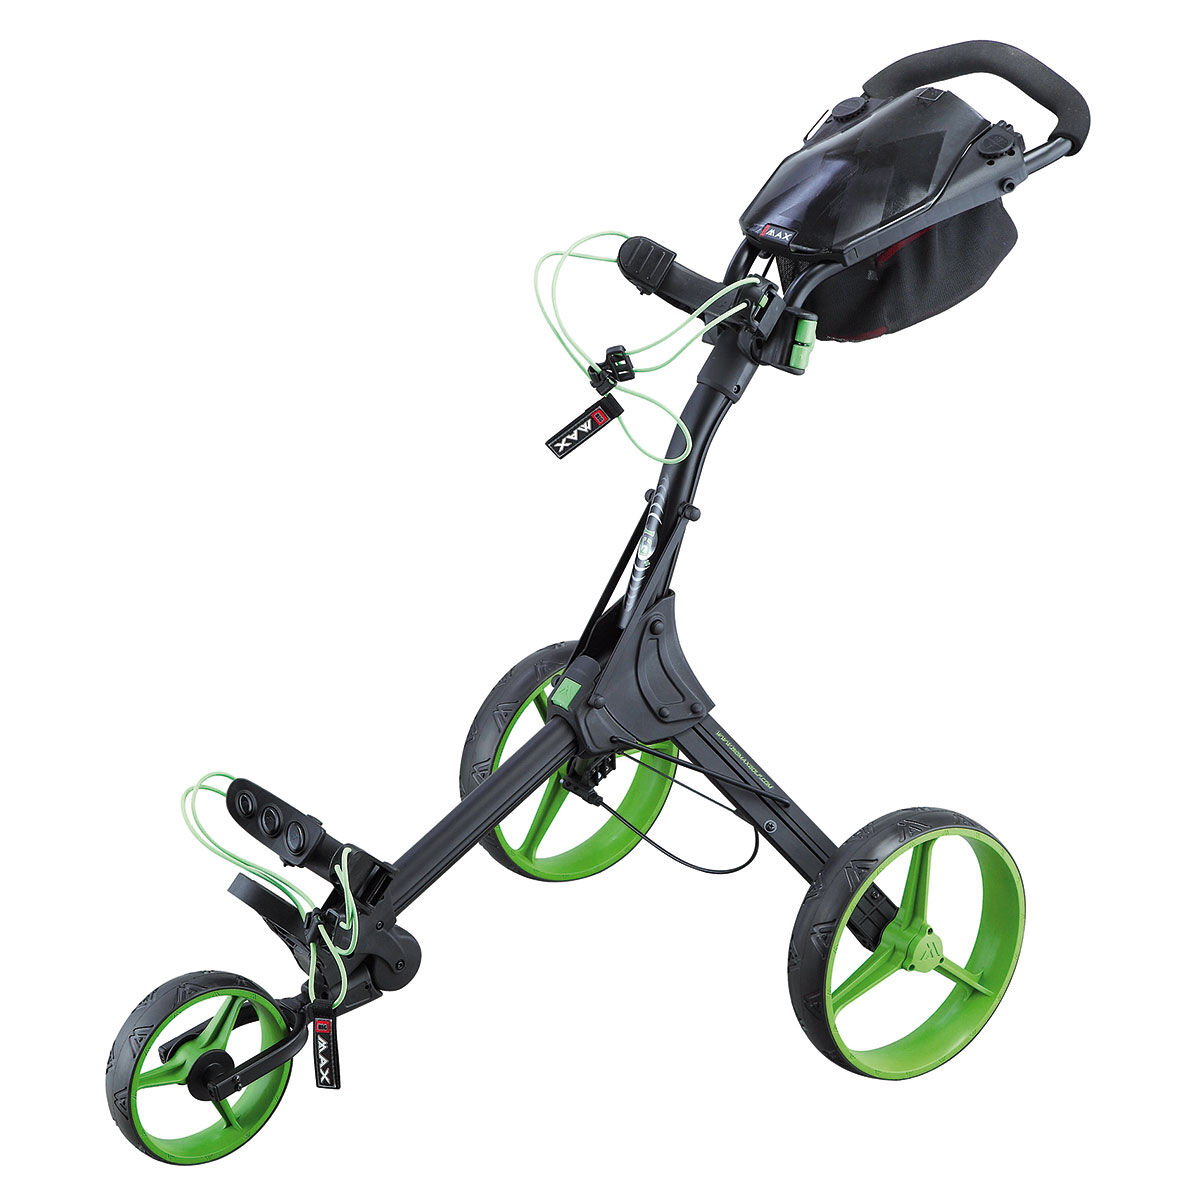 BIG MAX IQ+ Golf Trolley, Black/lime, One Size | American Golf